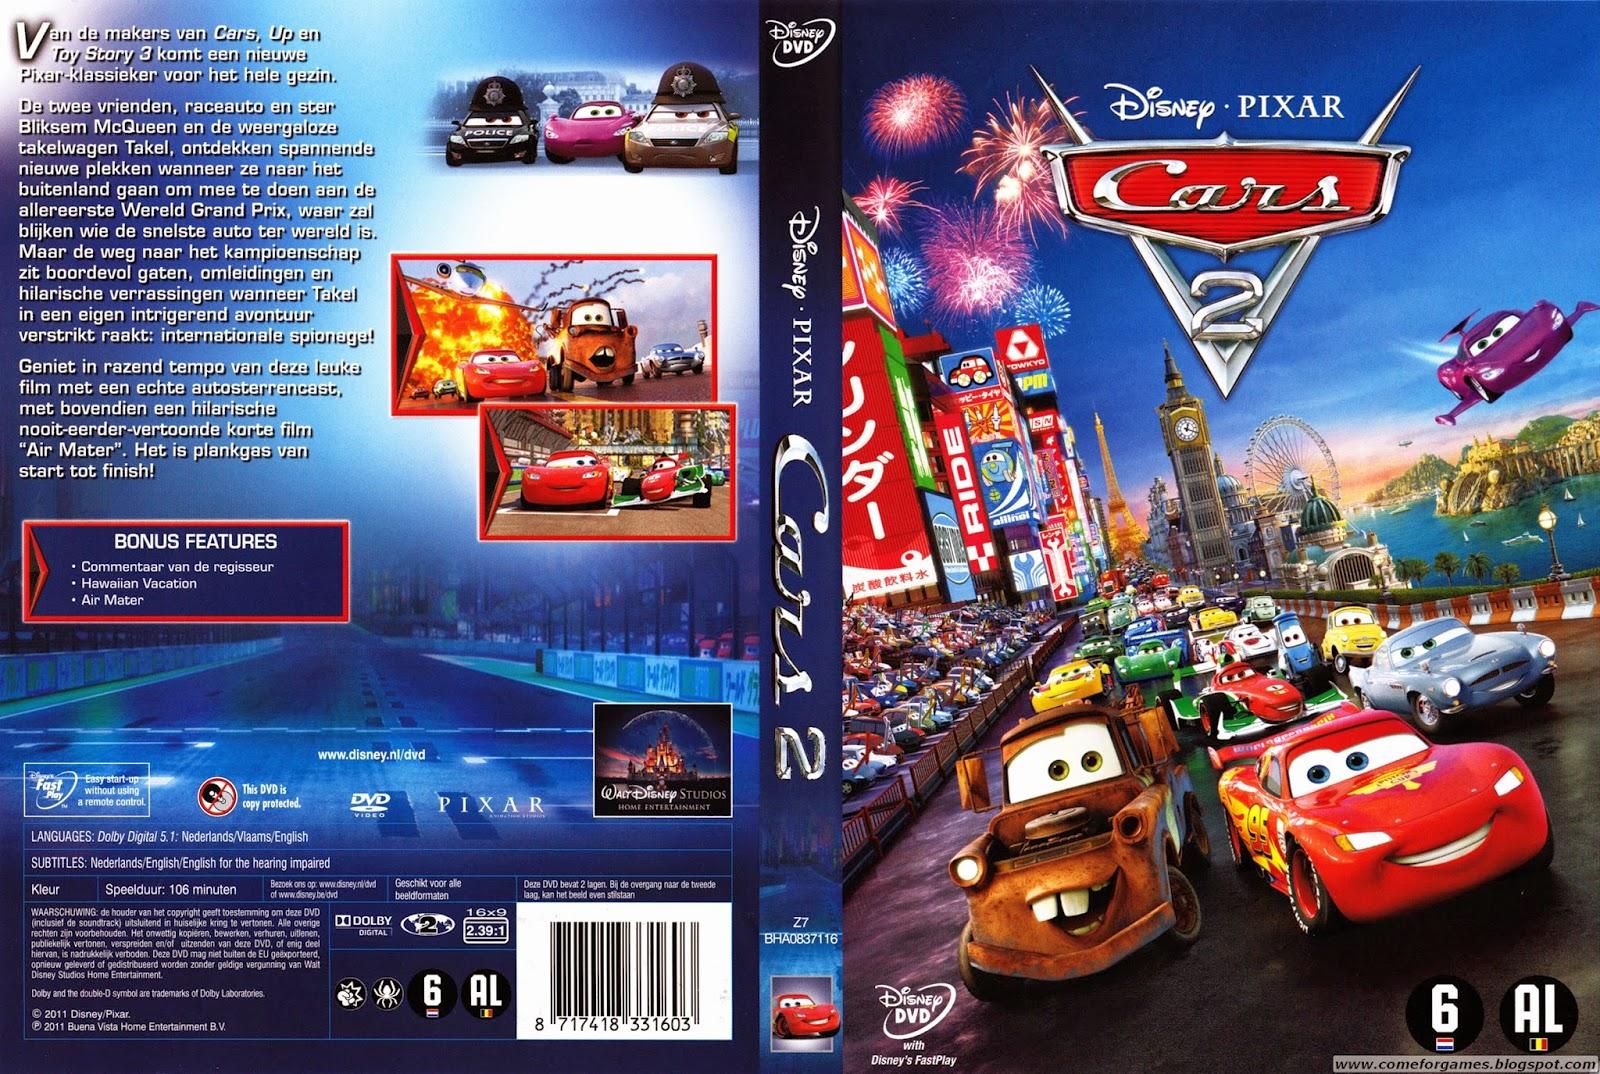 DisneyPixar Cars 2 The Video Game on Steam